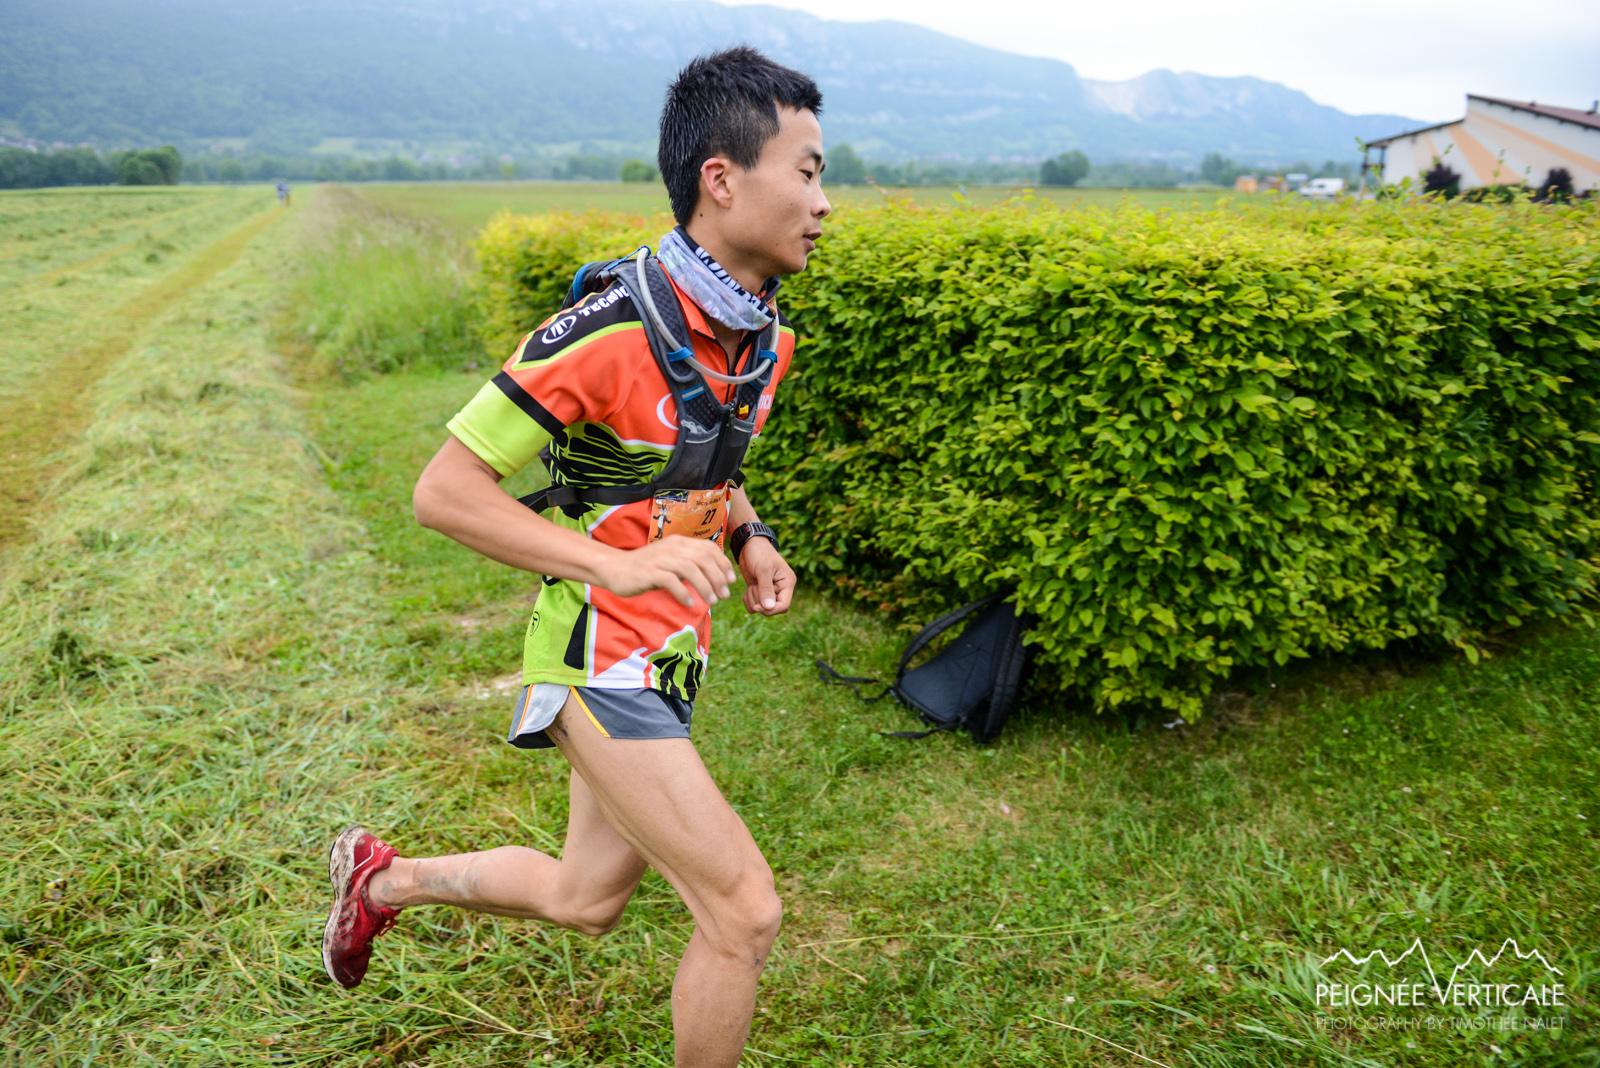 MaxiRace-Annecy-2014-Team-Hoka-Timothee-Nalet-0902.jpg